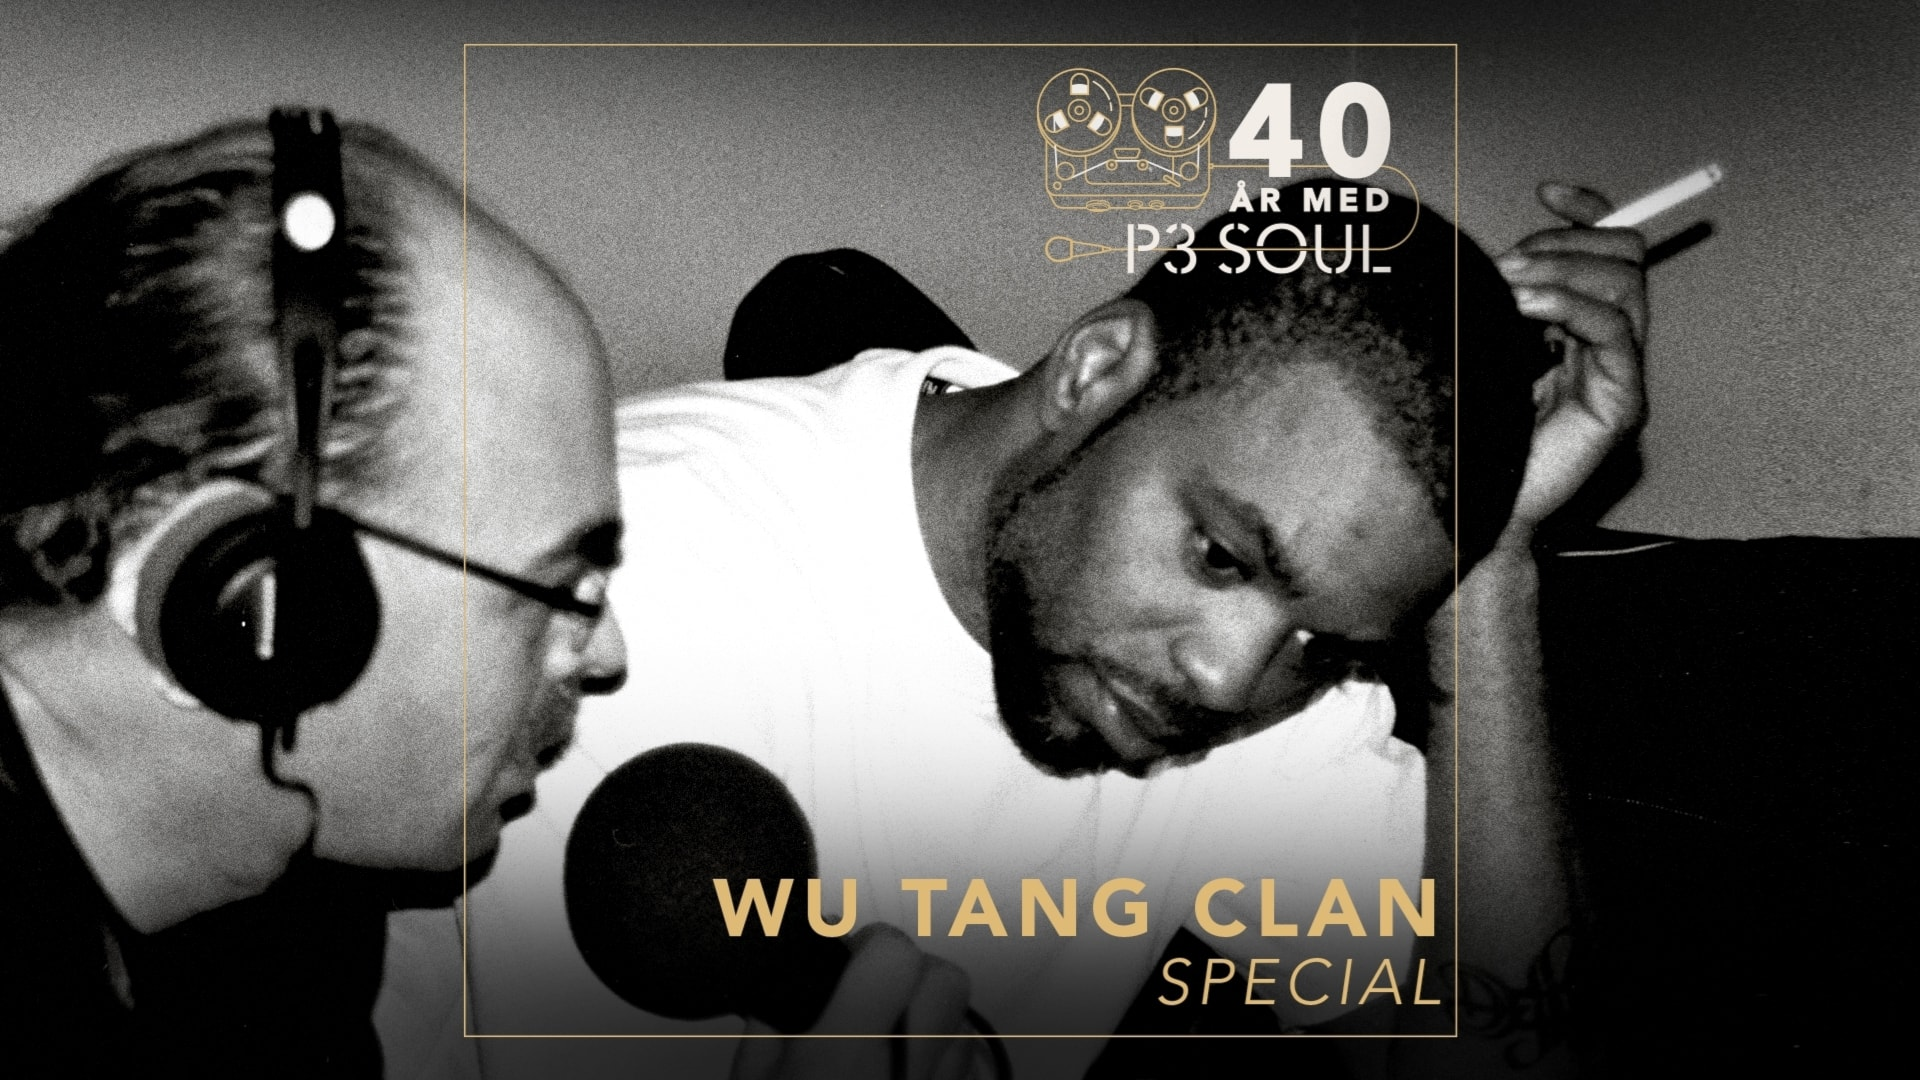 40 år med P3 Soul: Wu Tang Clan-special